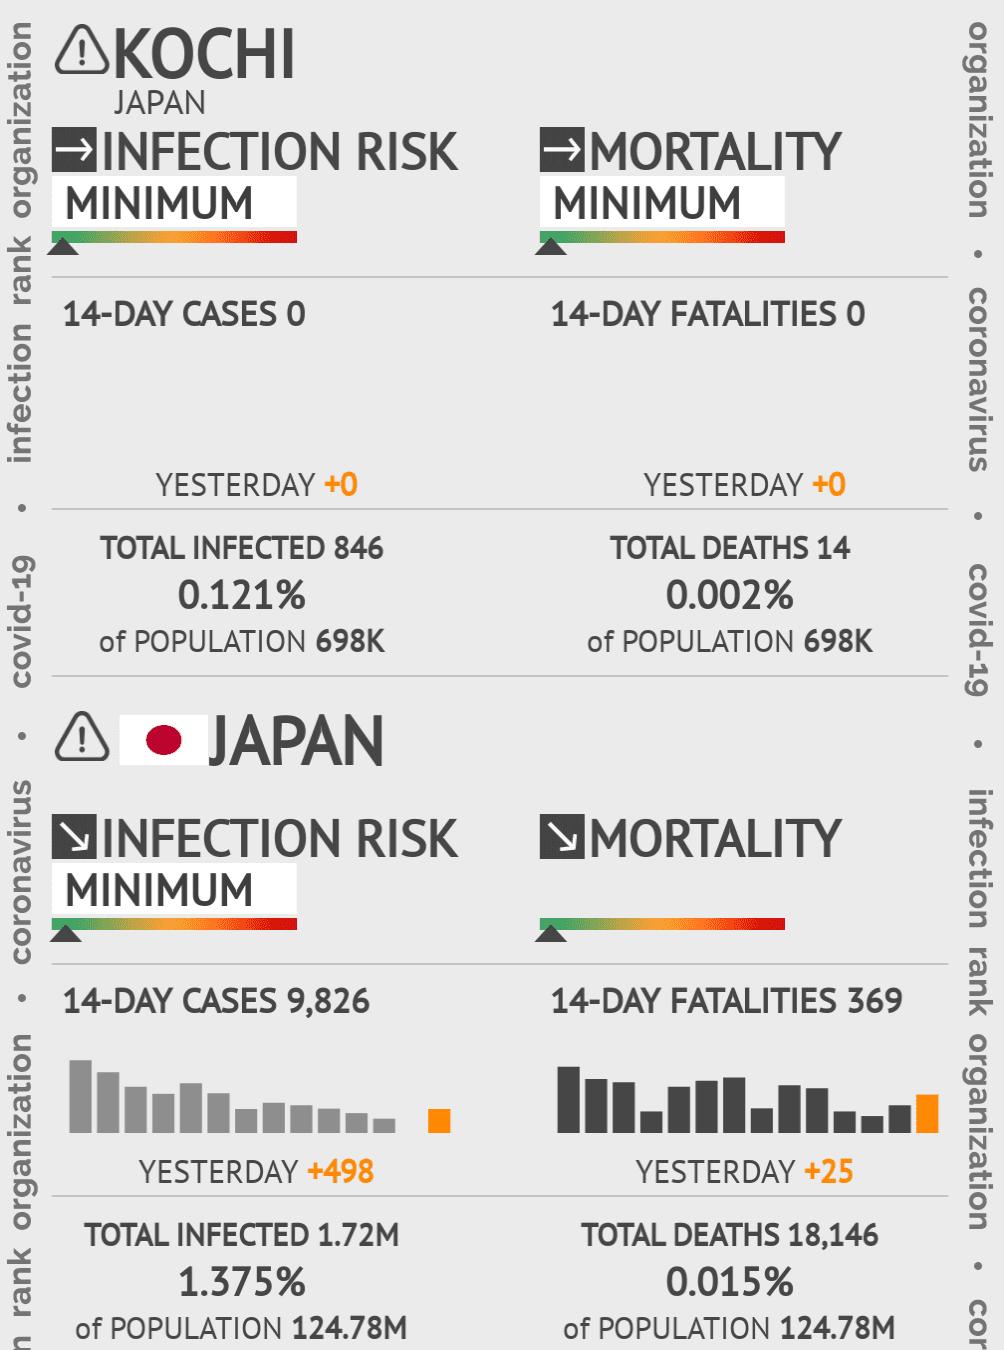 Kochi Coronavirus Covid-19 Risk of Infection on March 06, 2021